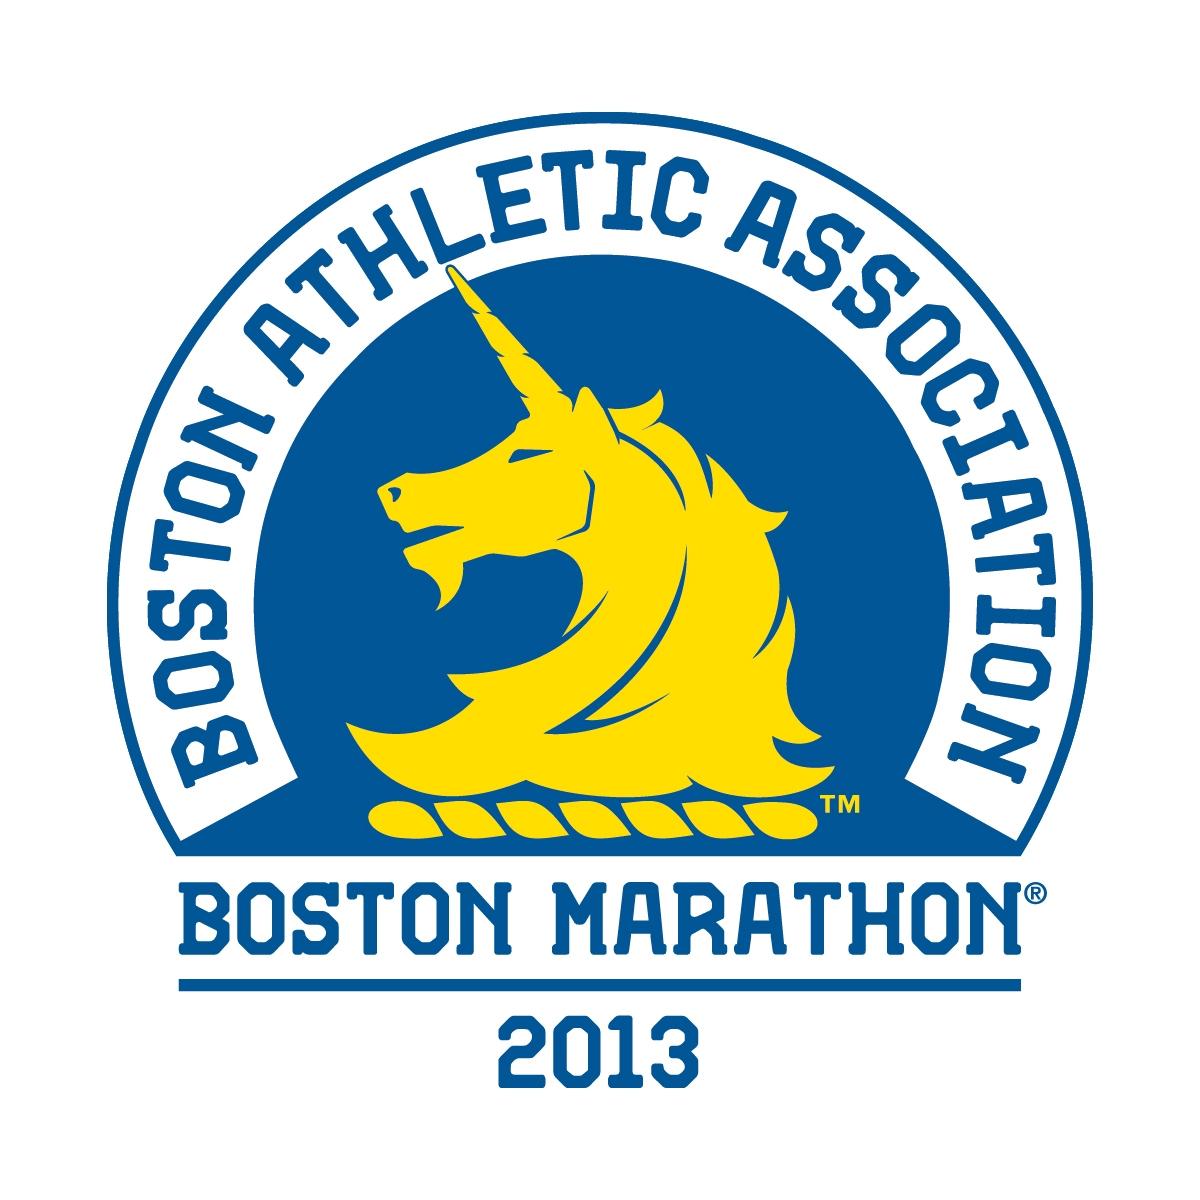 Explosions at 2013 Boston Marathon